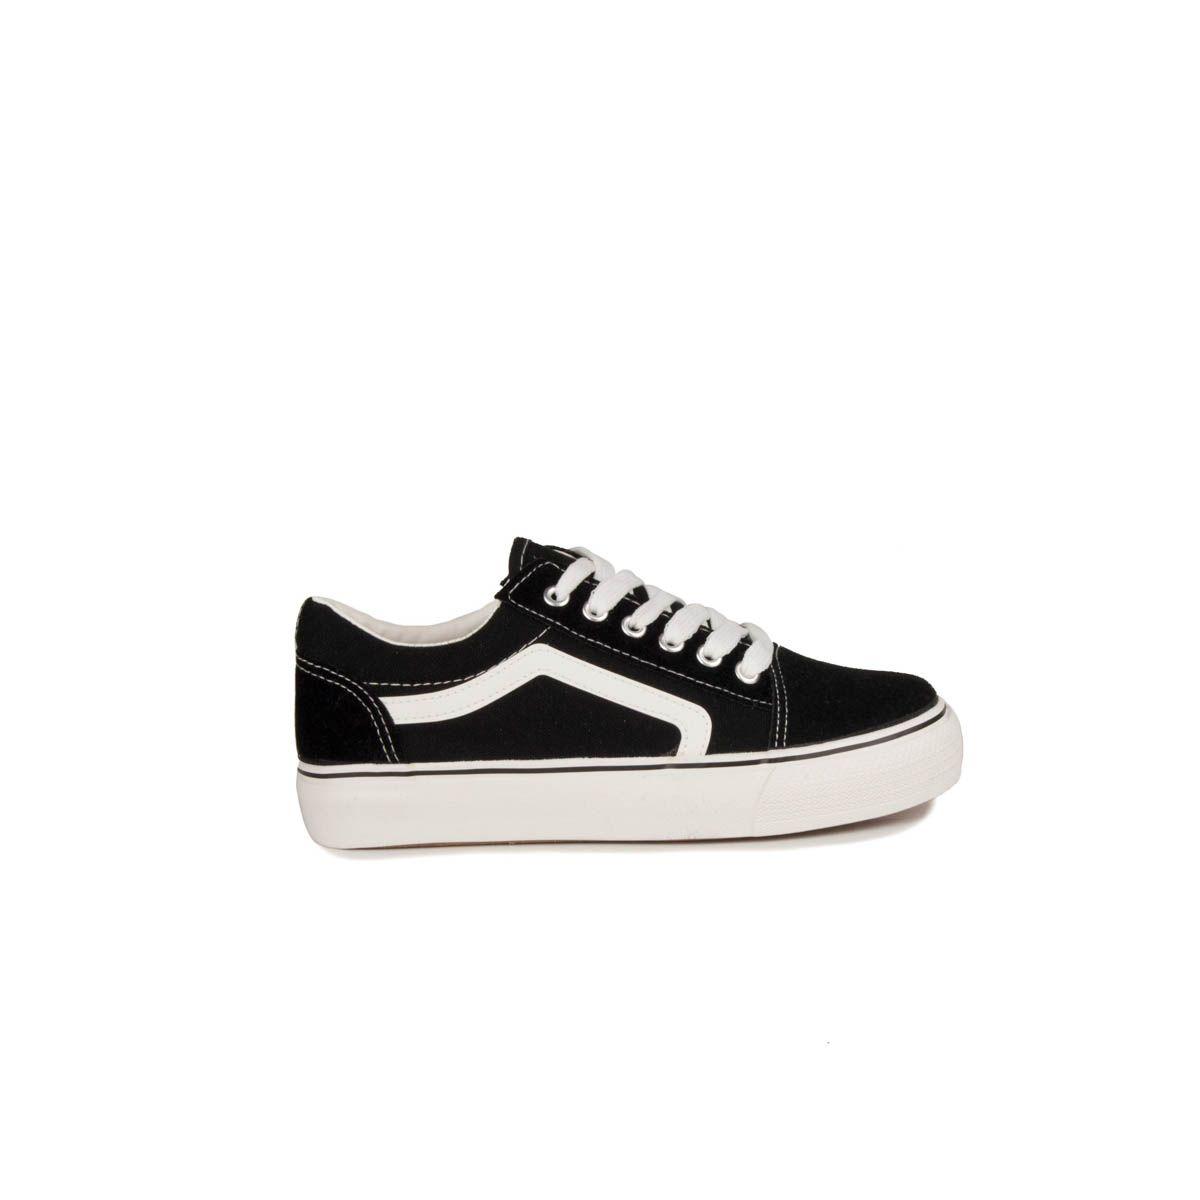 Montevita Comfortable Sneaker in Black